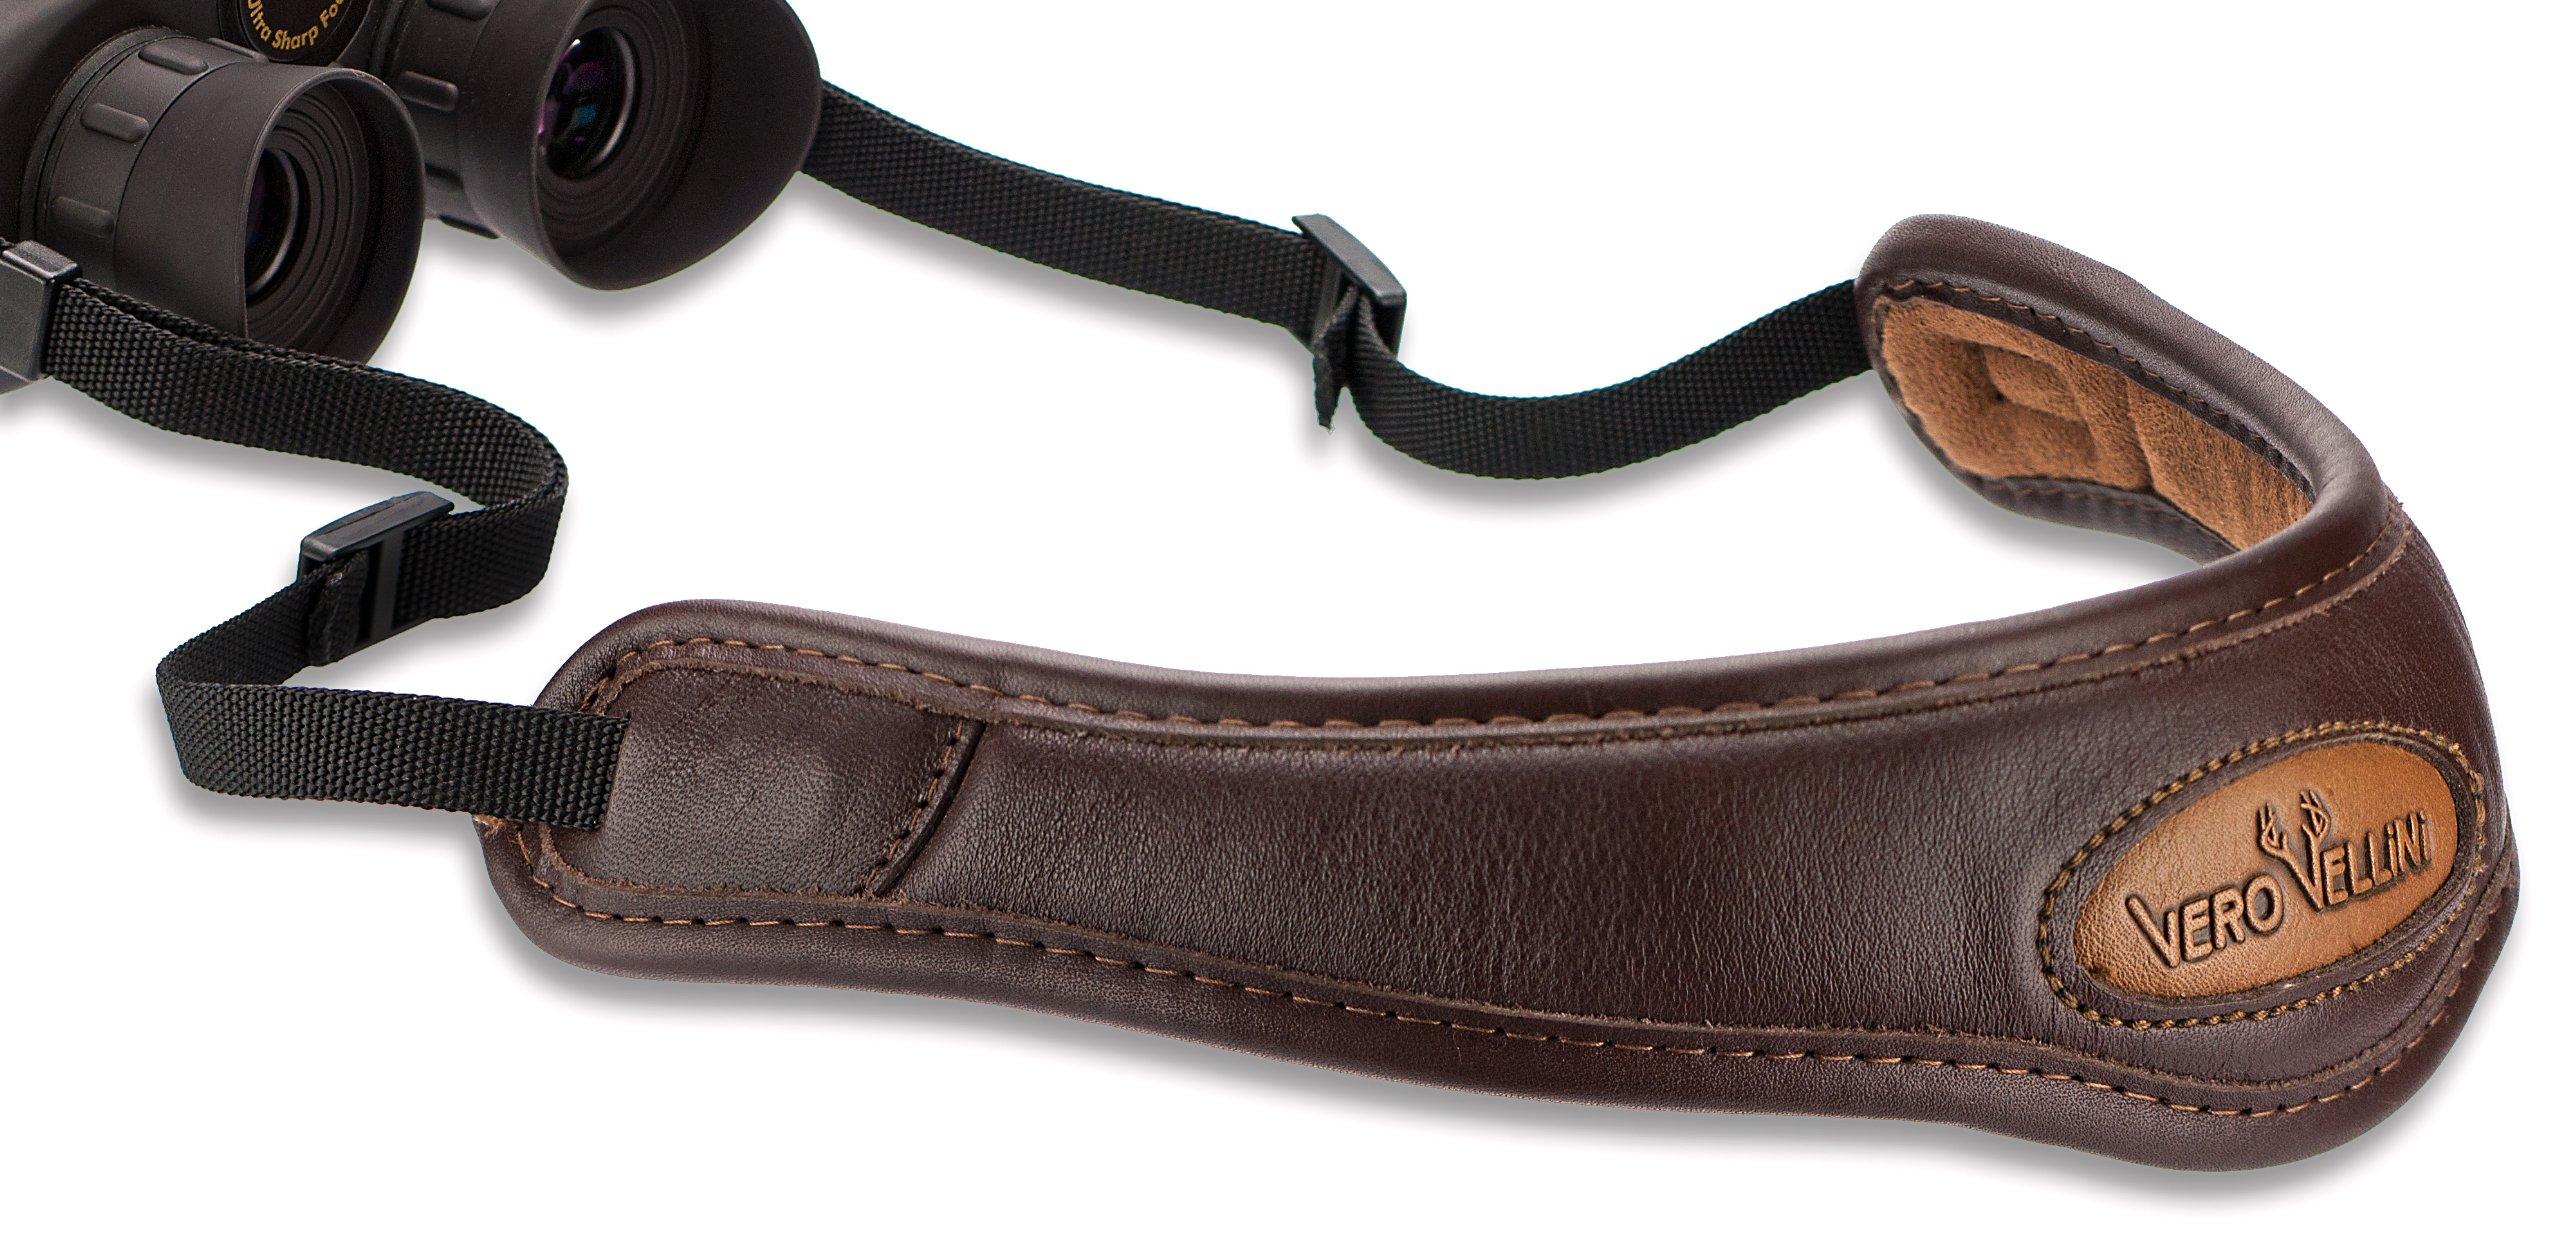 Vero Vellini Contour Binocular Leather Sling, Brown, 36-Inch by Vero Vellini (Image #1)